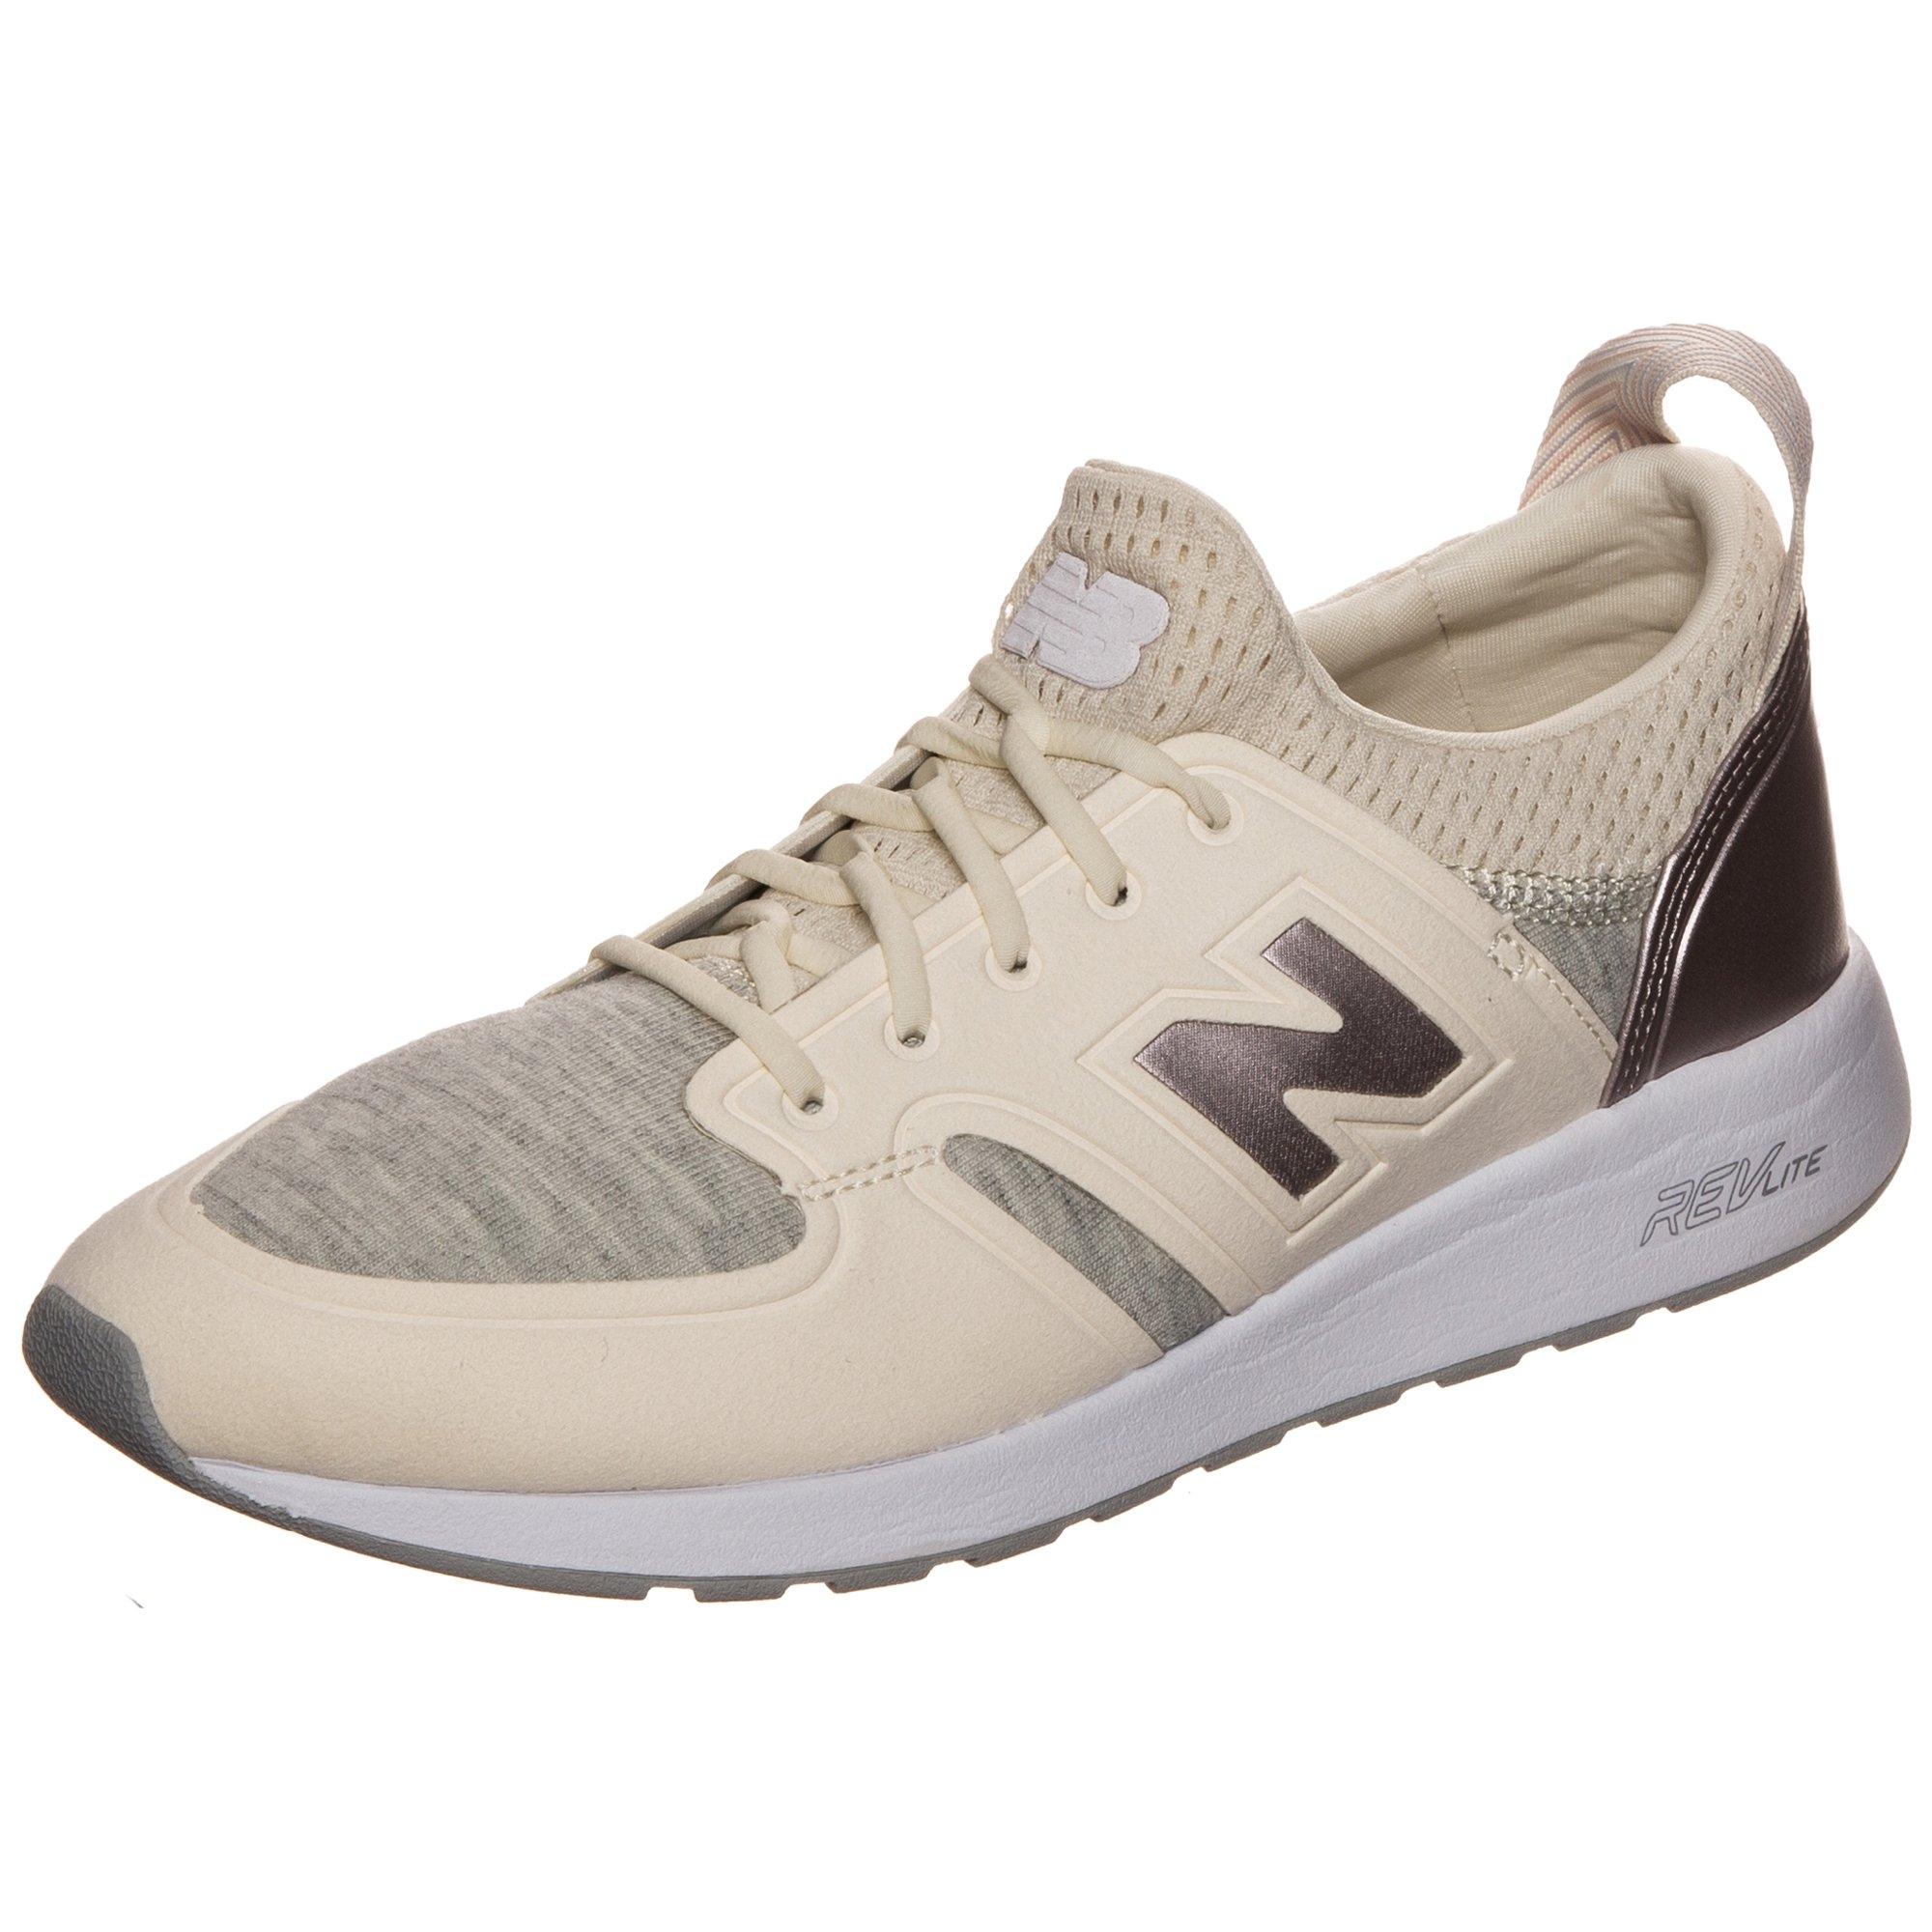 new balance sneakers »Wrl420-sd-b« nu online bestellen